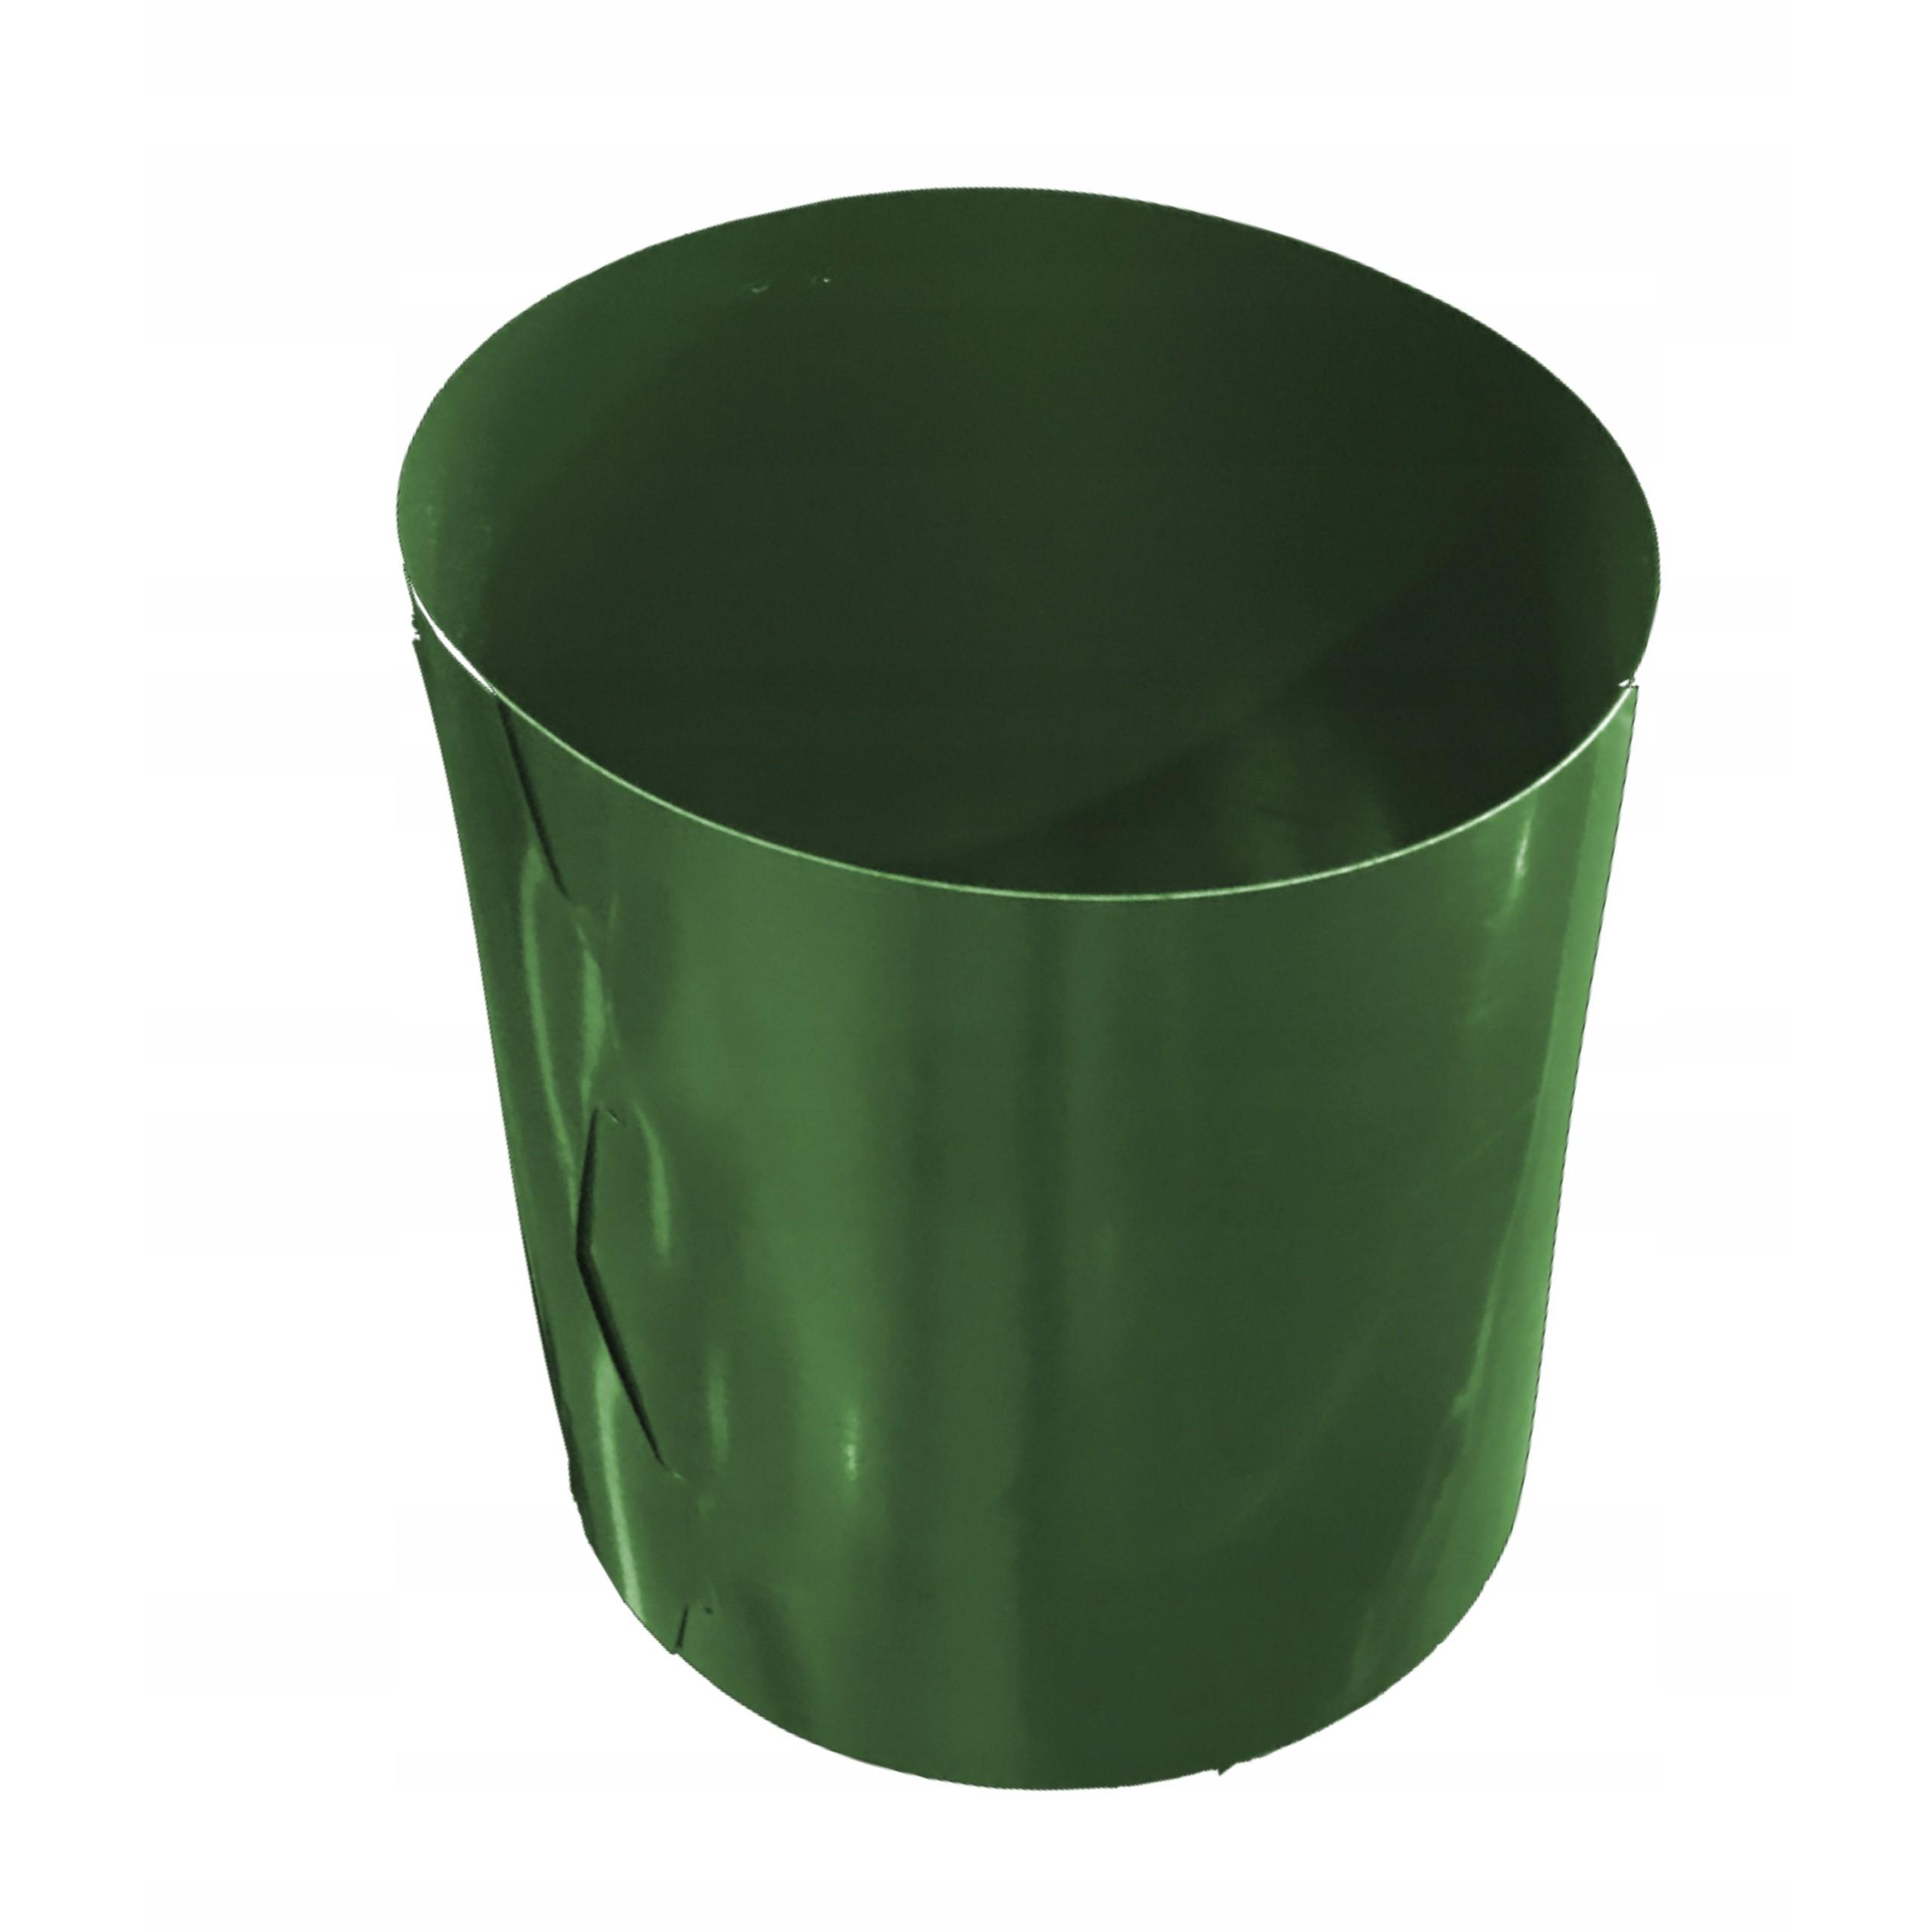 Květináč 10 ks skládací 20x20 cm PVC megamix.shop